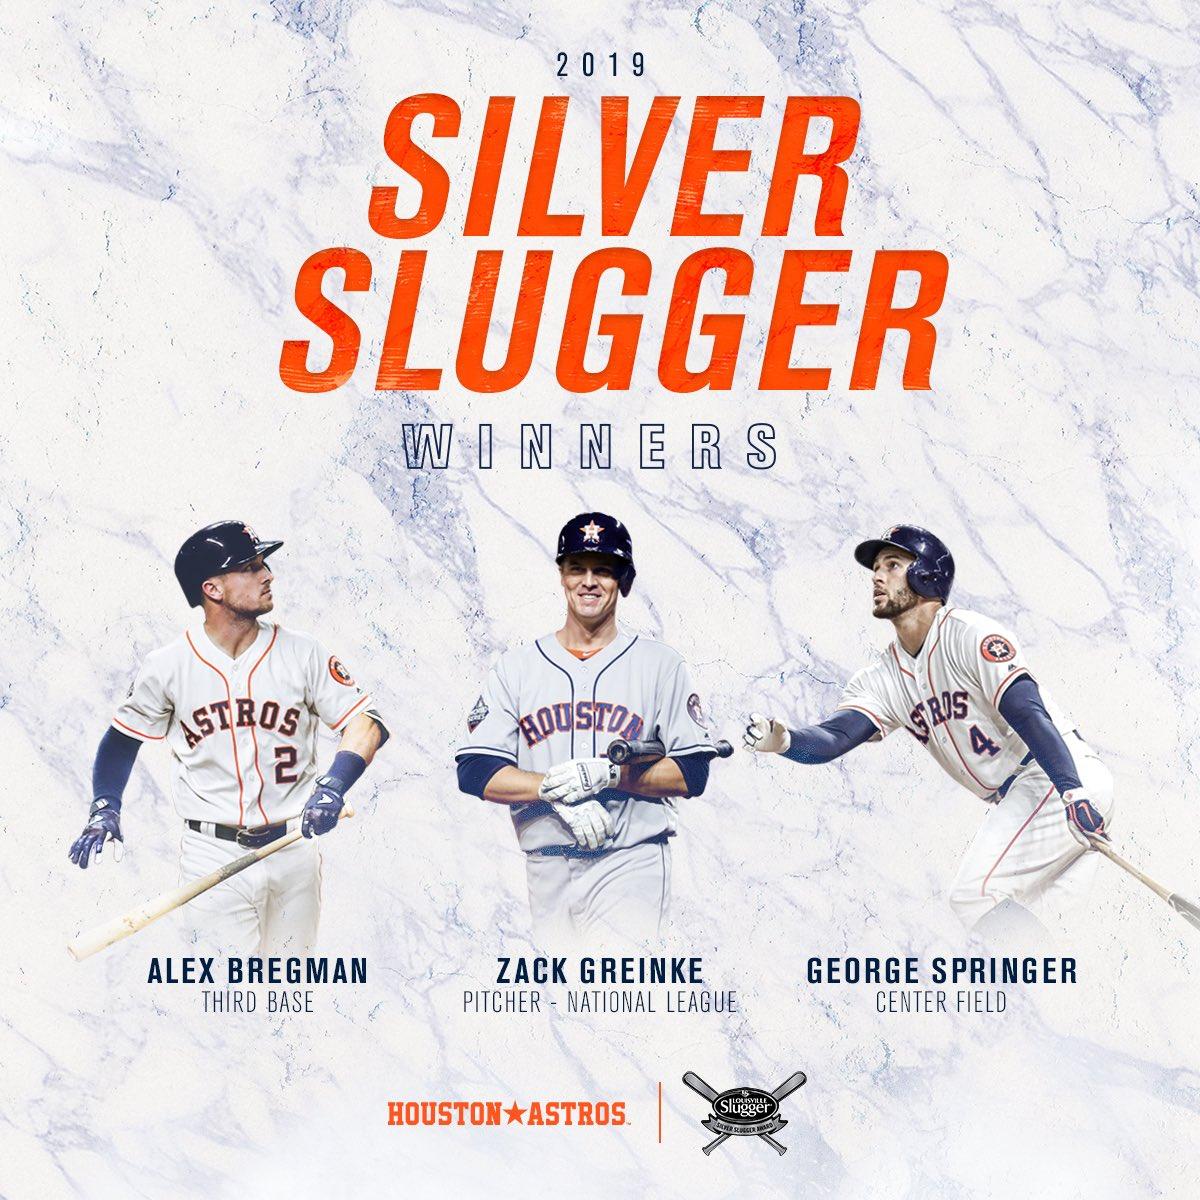 🗣 stick talk 🗣 Congratulations to Greinke, @ABREG_1 and @GeorgeSpringer on winning Silver Slugger Awards!